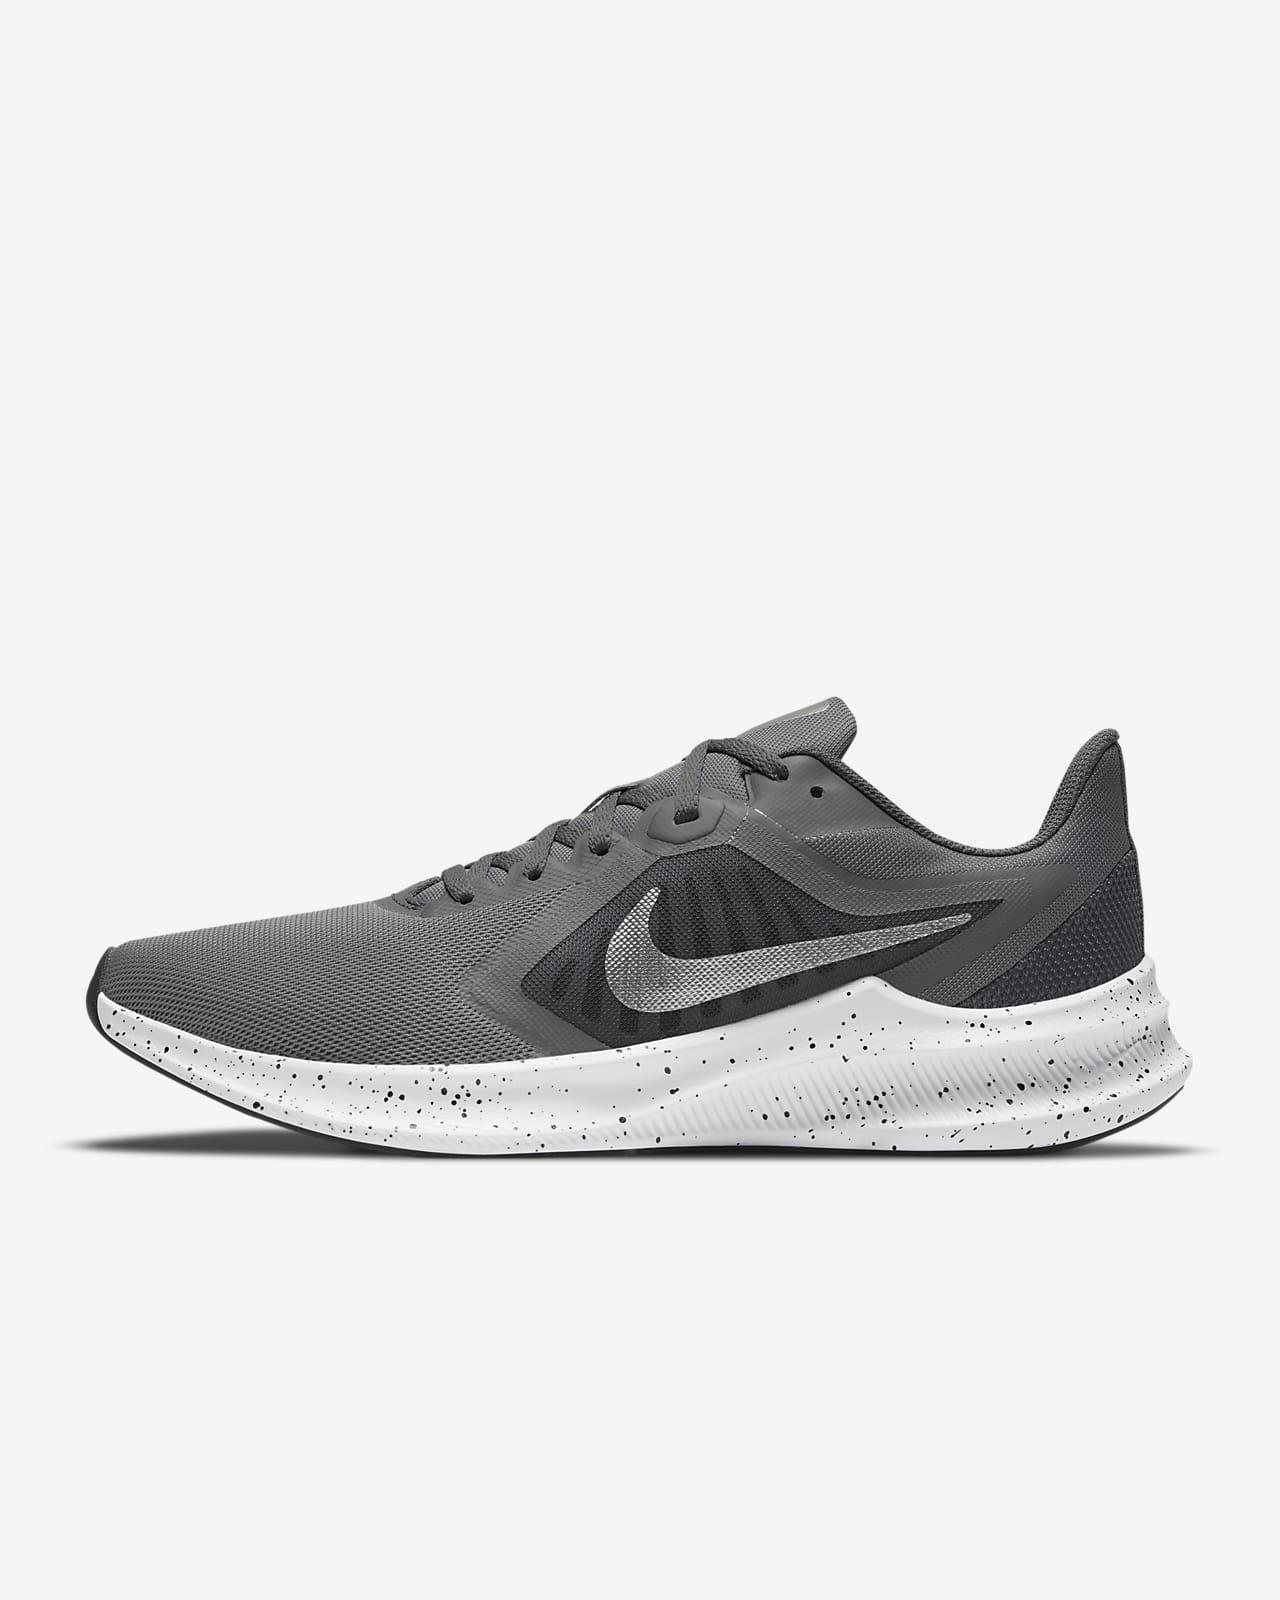 Nike Downshifter 10 Premium Running Shoe